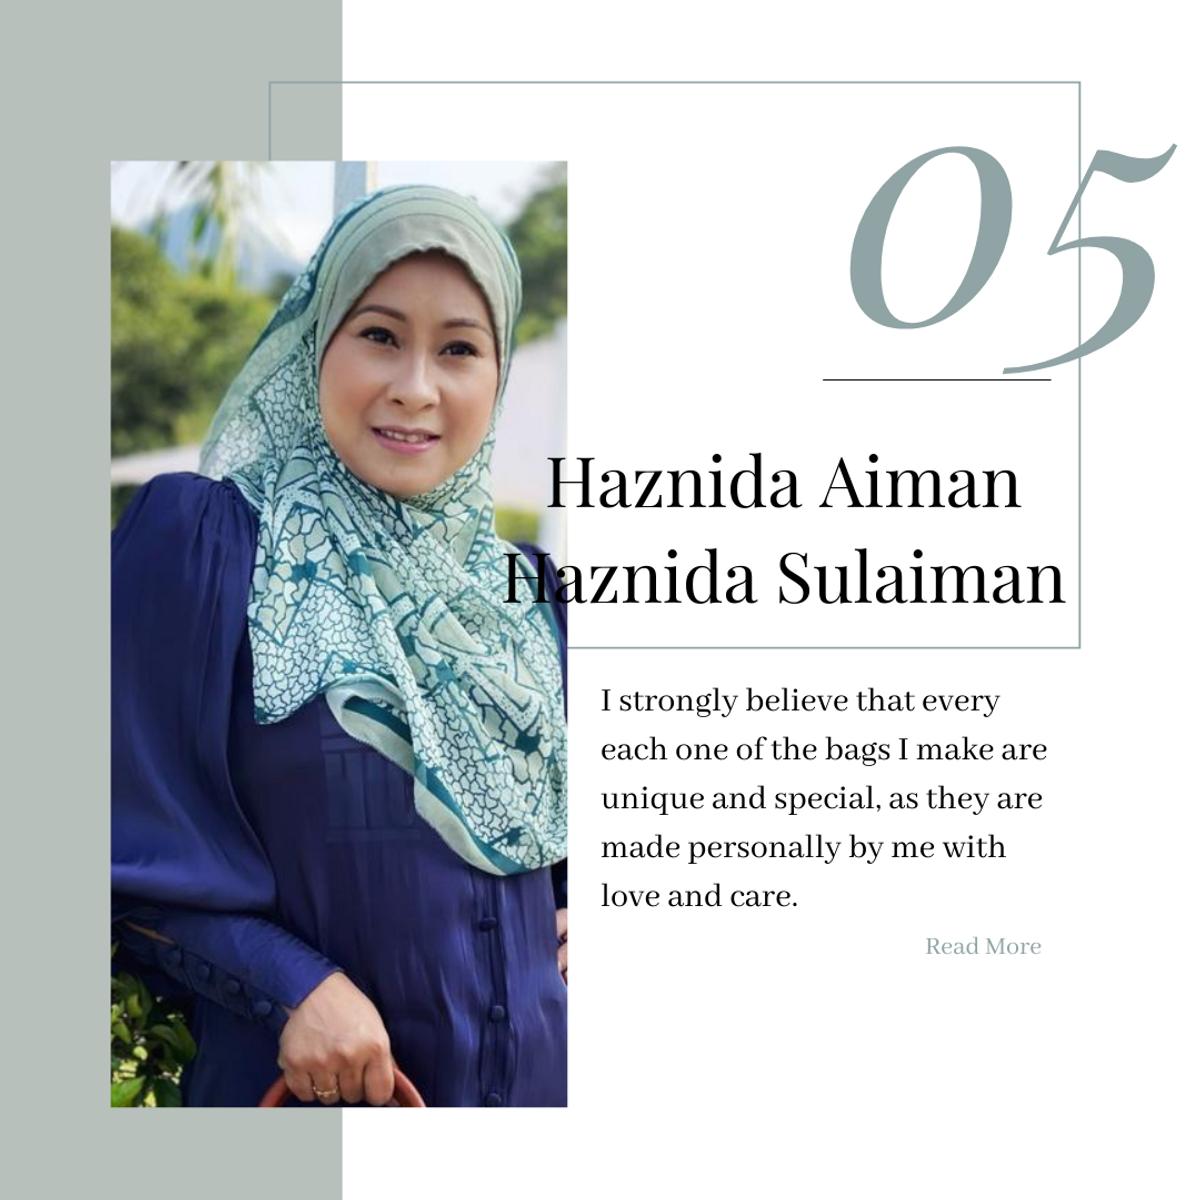 Pembuat Beg Tangan Malaysia - Haznida Aiman/ Haznida Sulaiman